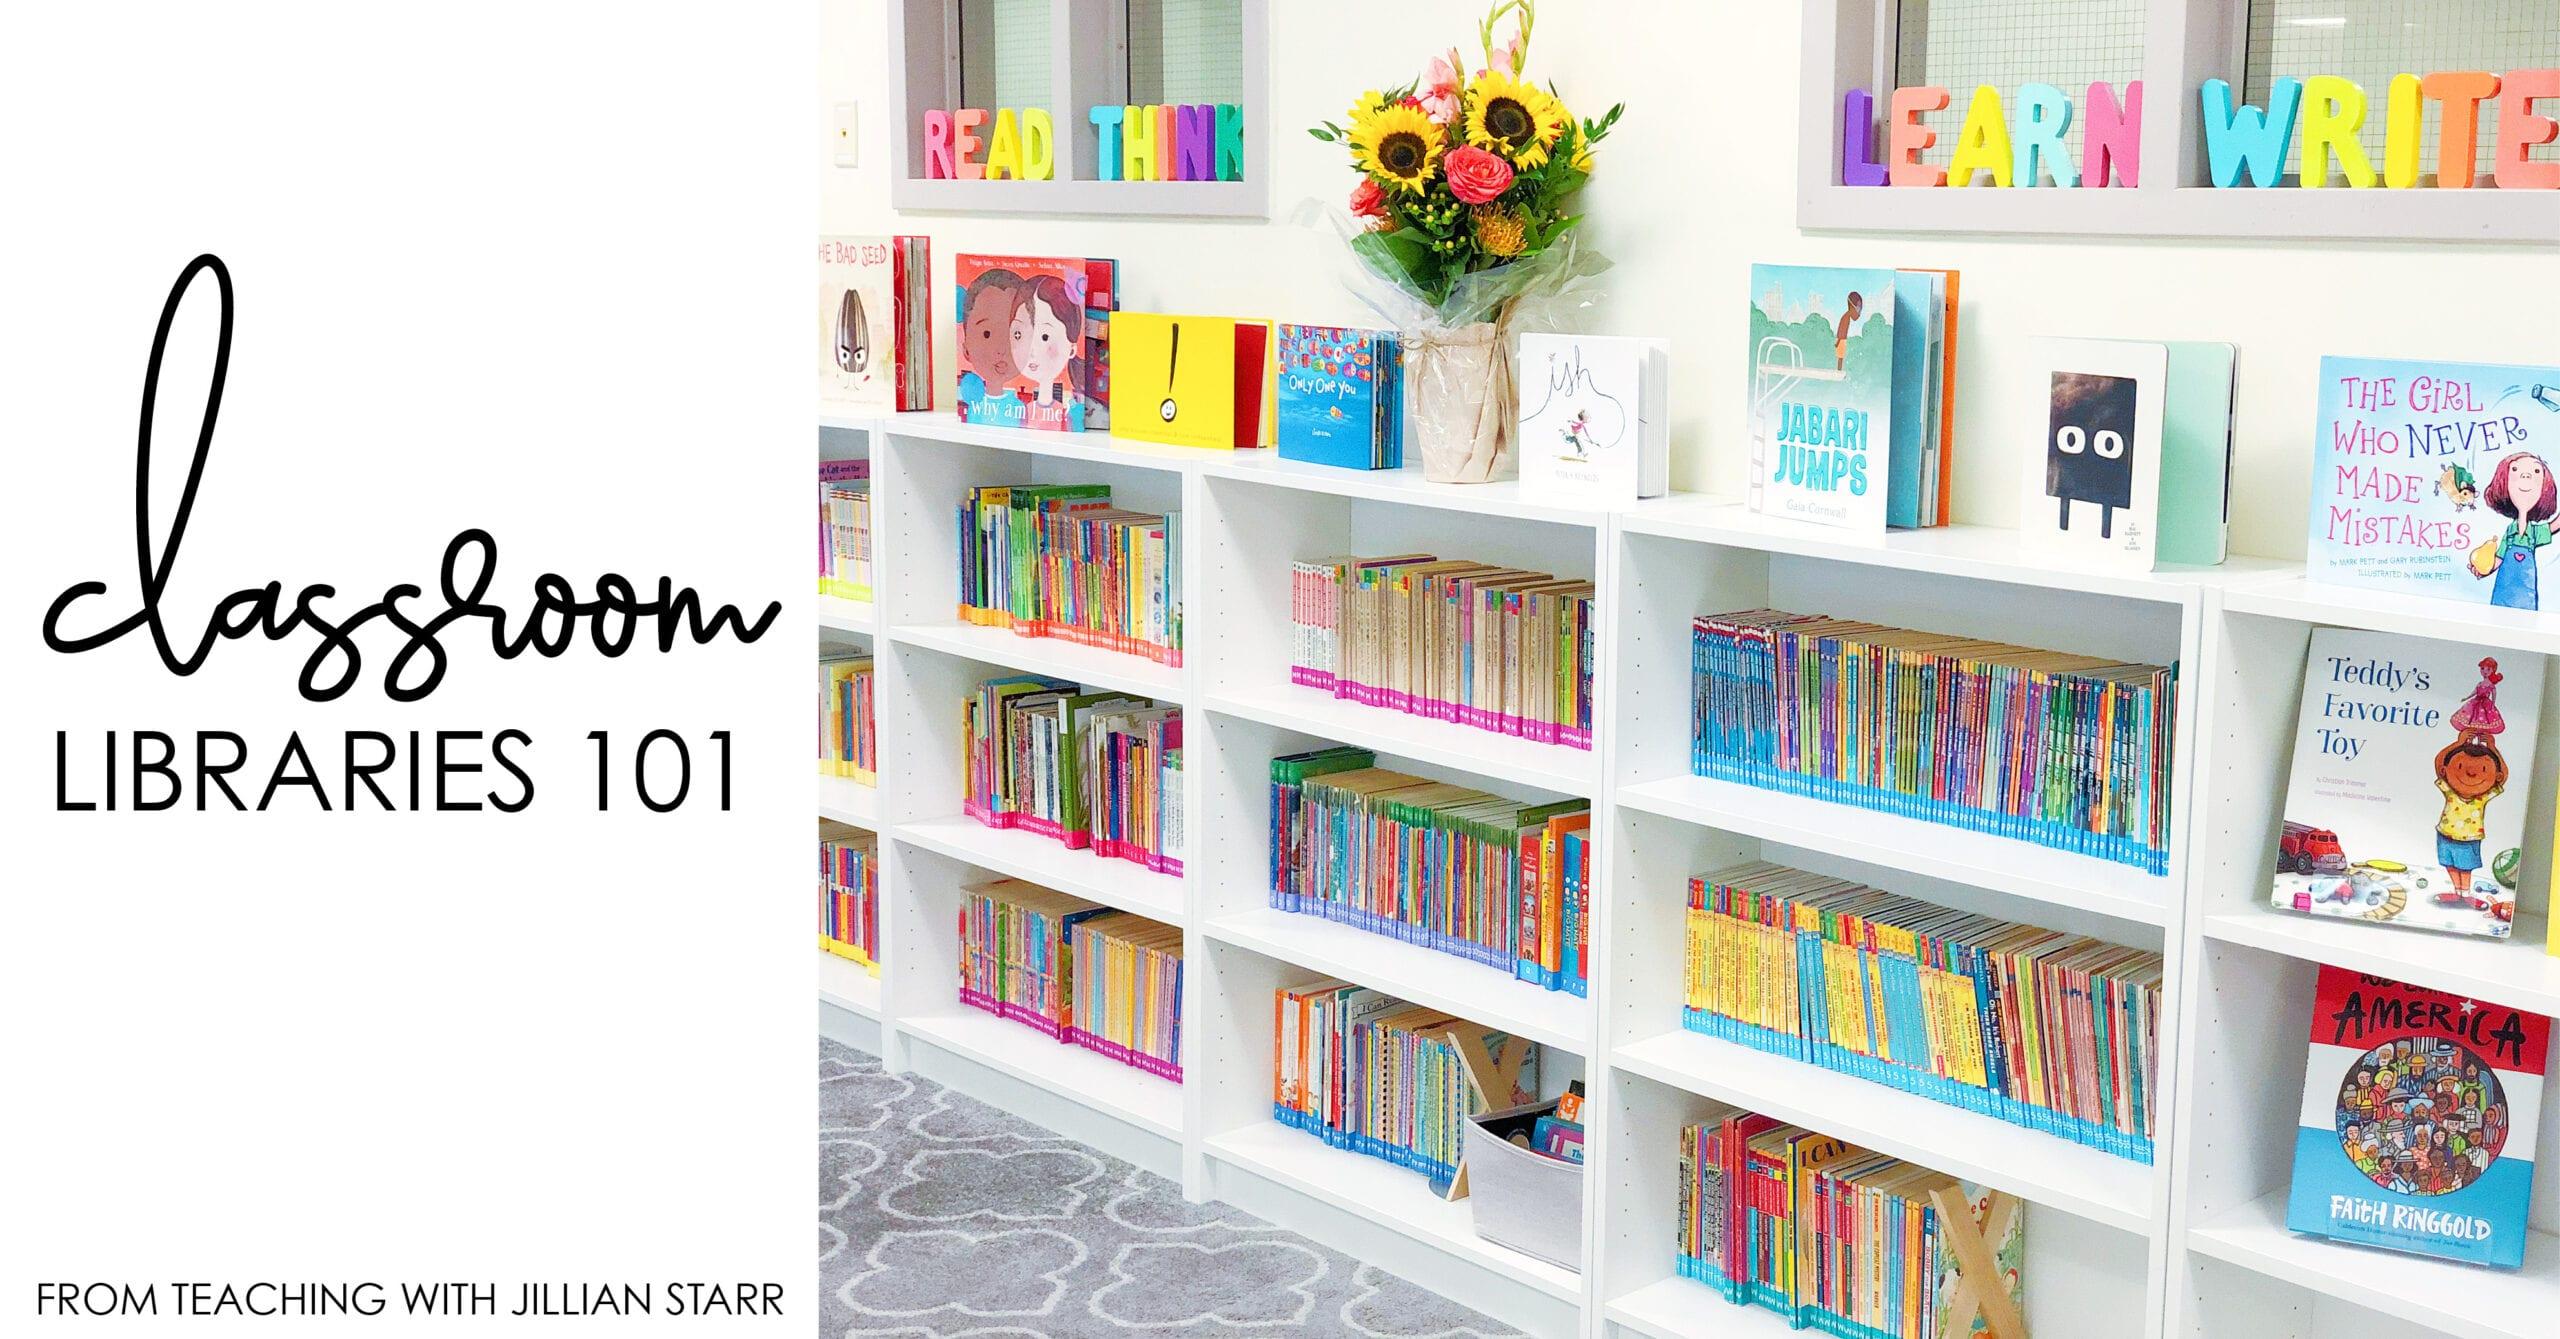 Remarkable Classroom Library Organization Teaching With Jillian Starr Home Interior And Landscaping Spoatsignezvosmurscom